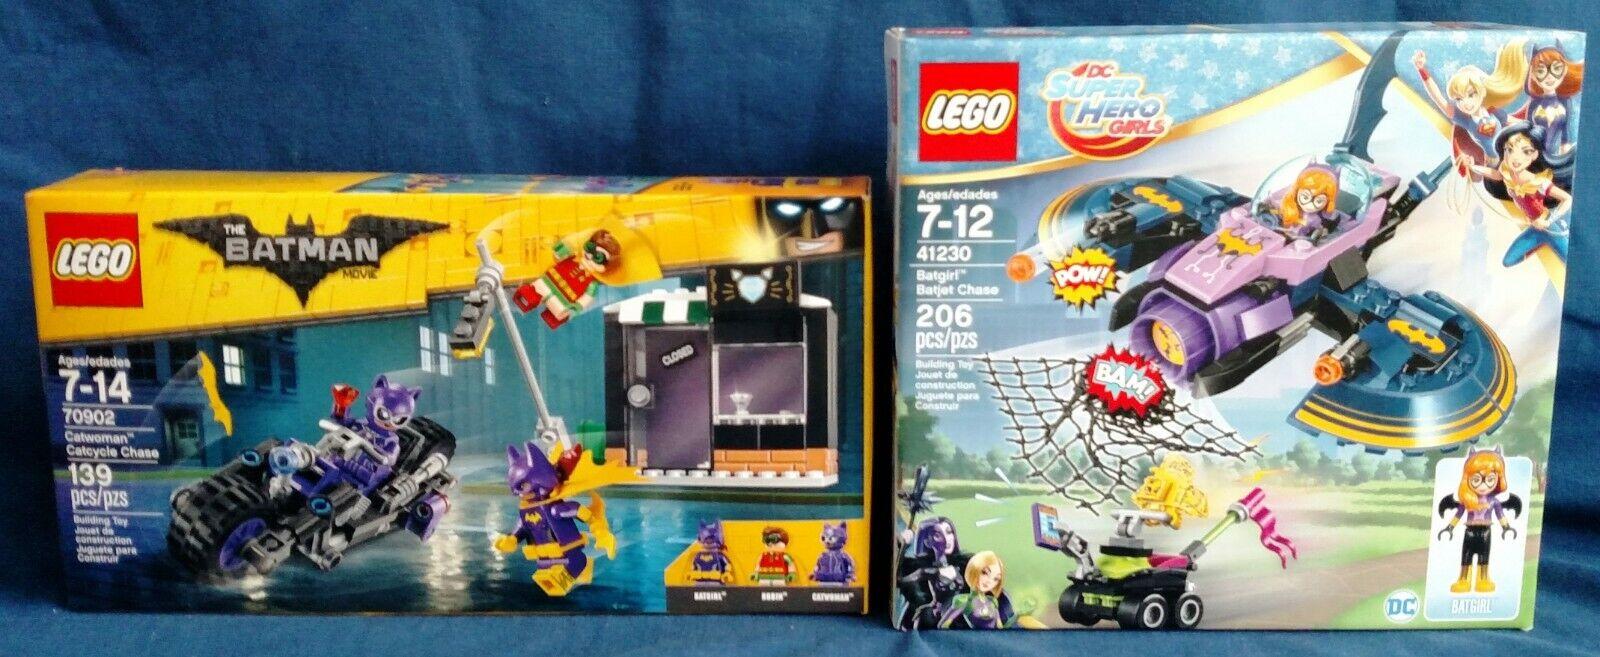 LEGO 70902 Catwoman Catcycle Catcycle Catcycle Chase & 41230 Batgirl Batjet Chase 034231